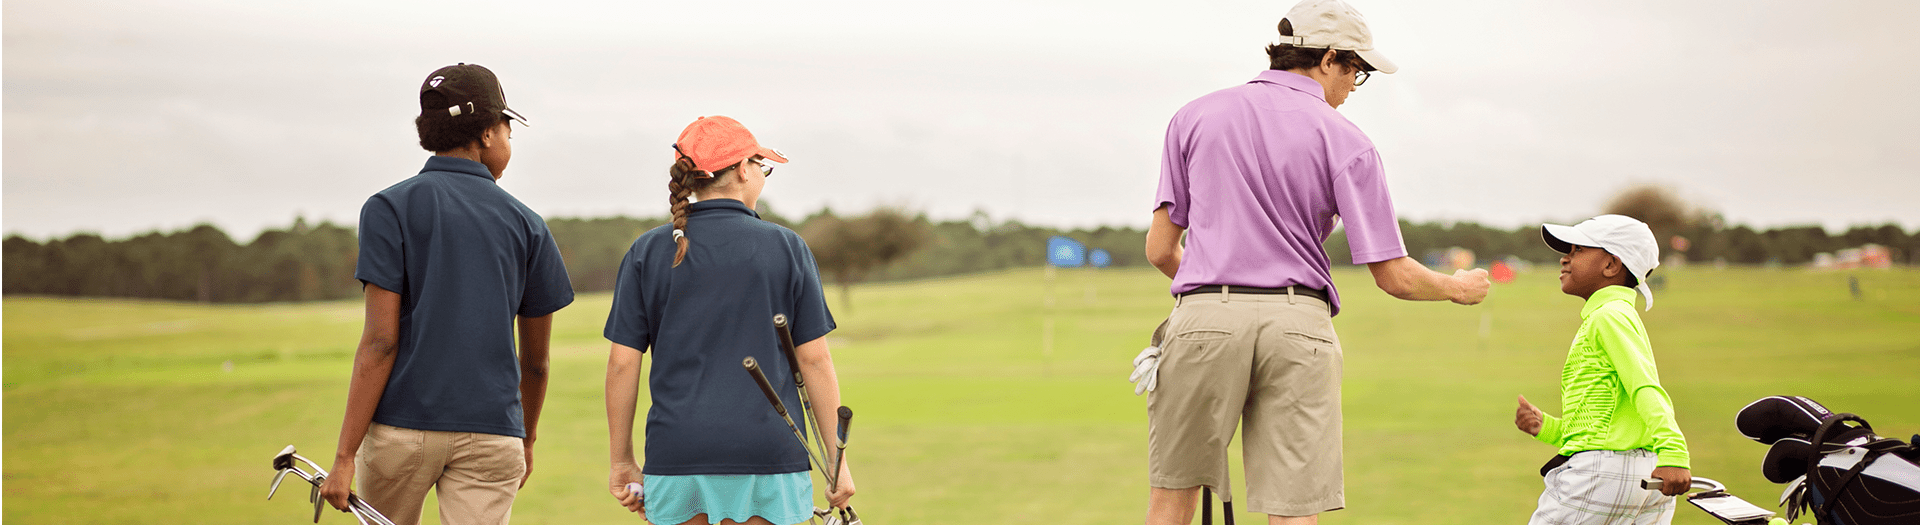 Kids walking onto a golf course